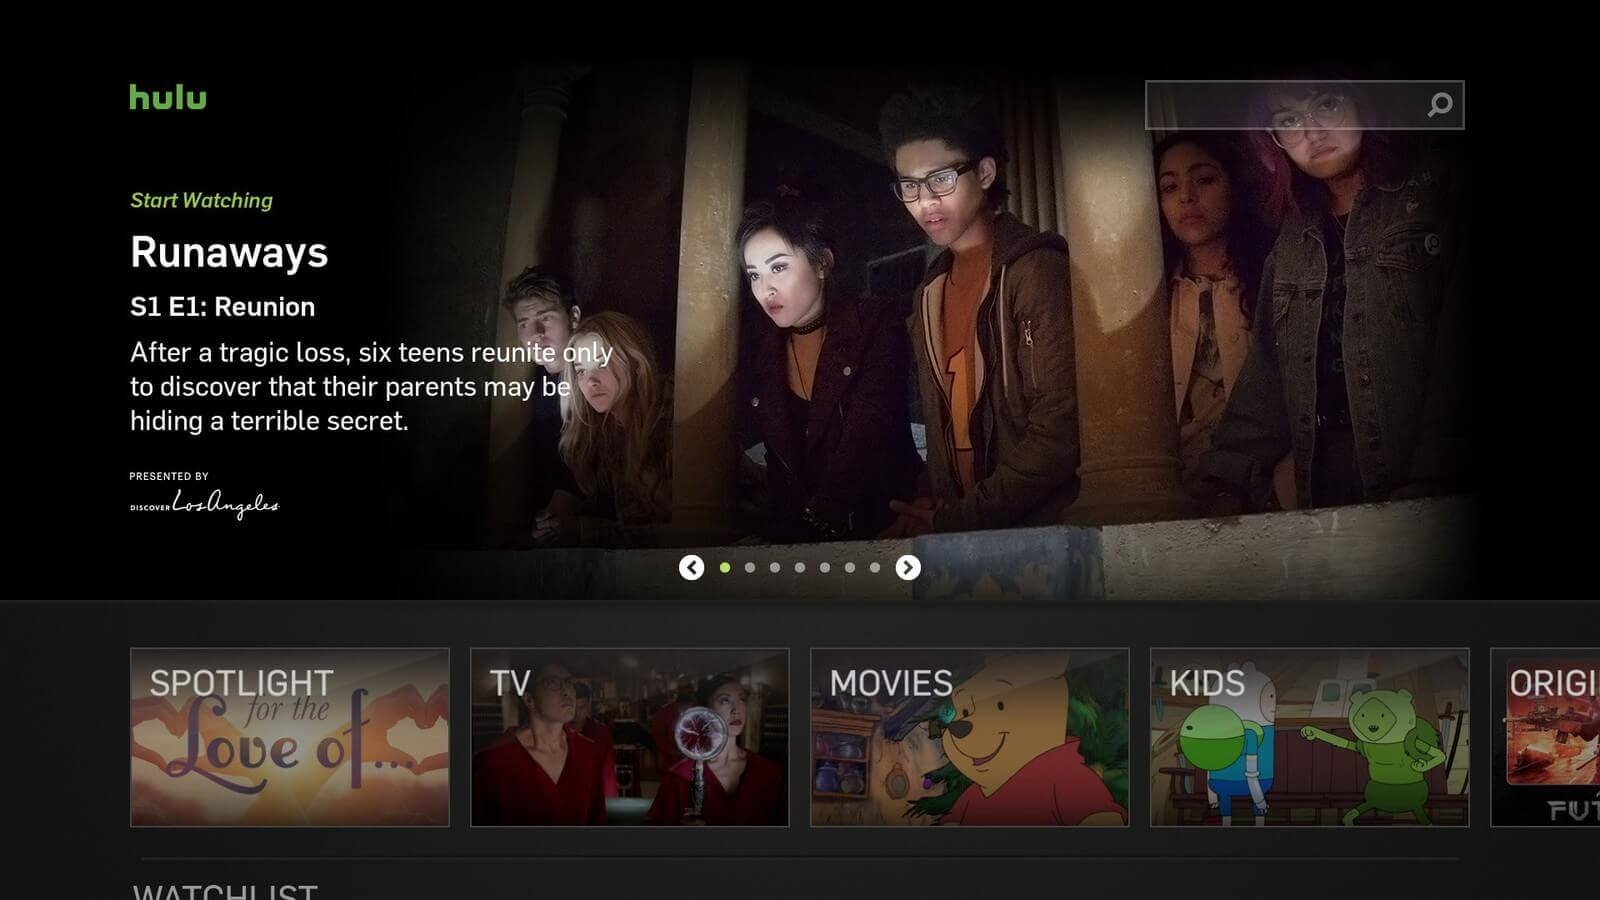 Hulu – good movie streaming website, but it is geo-restricted. Use VPN to unblock Hulu outside US